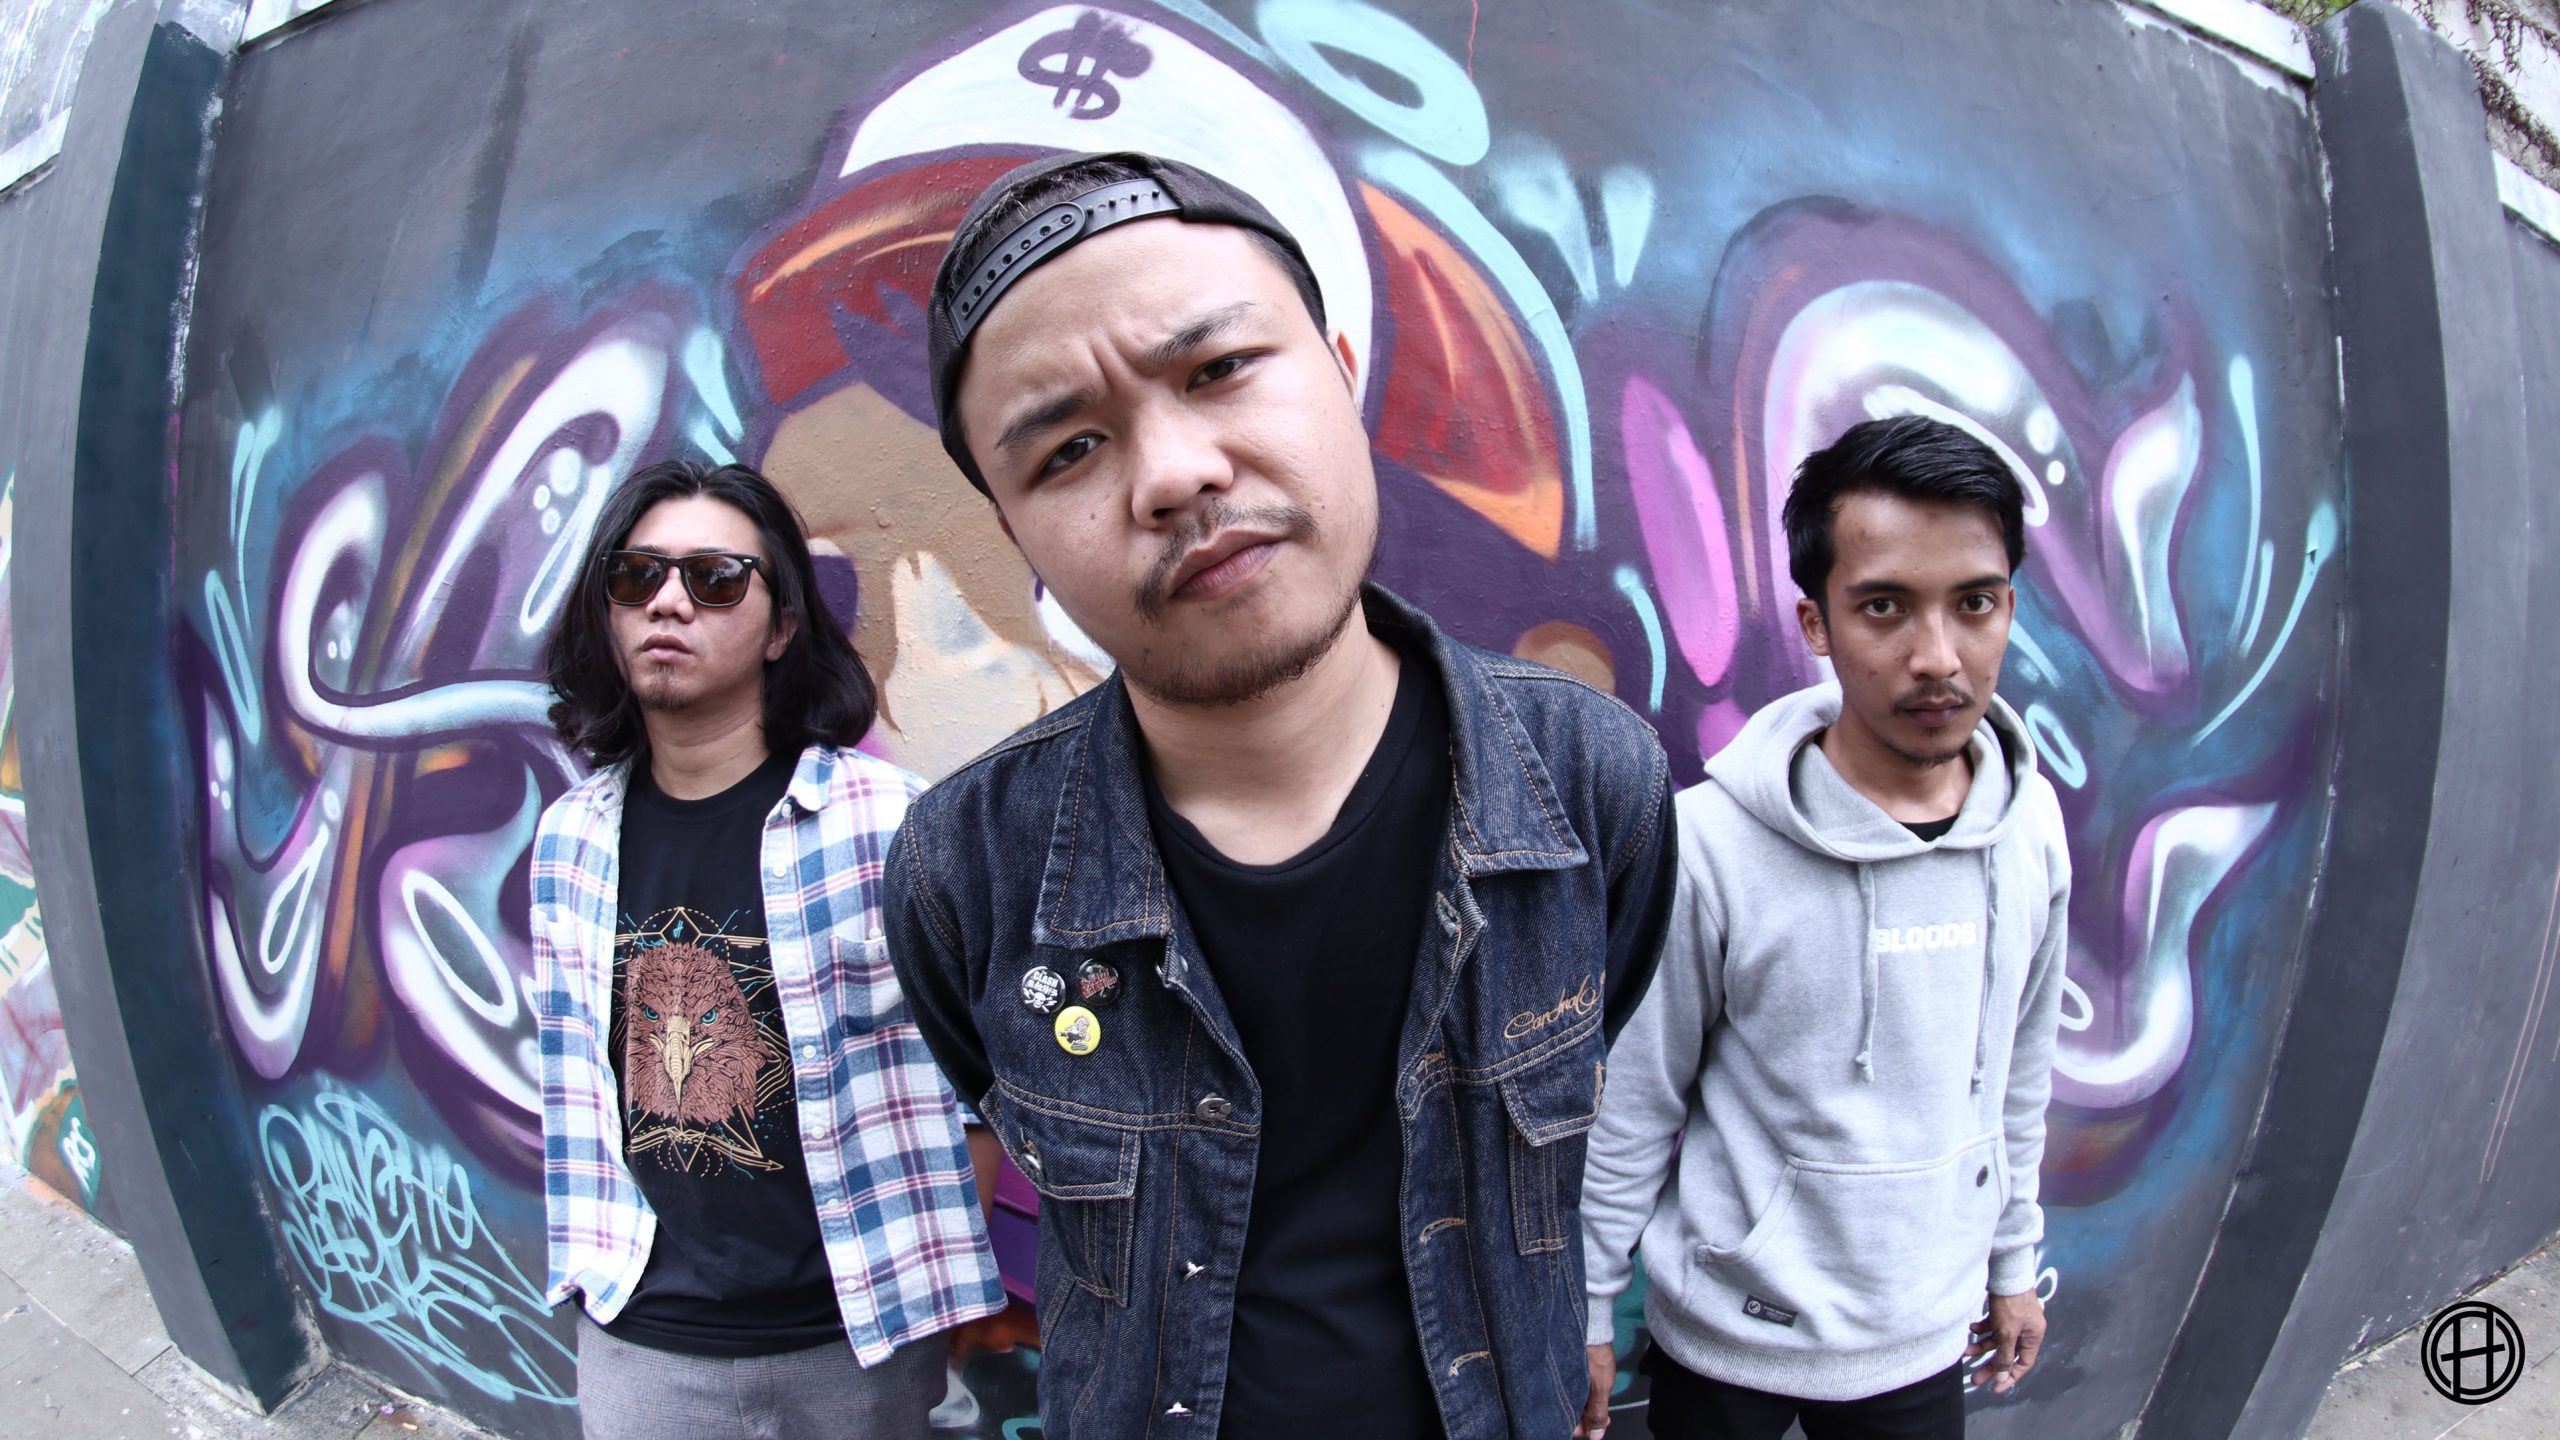 HLMN, Pengusung Rock Aroma Punk dari Perbatasan Bogor